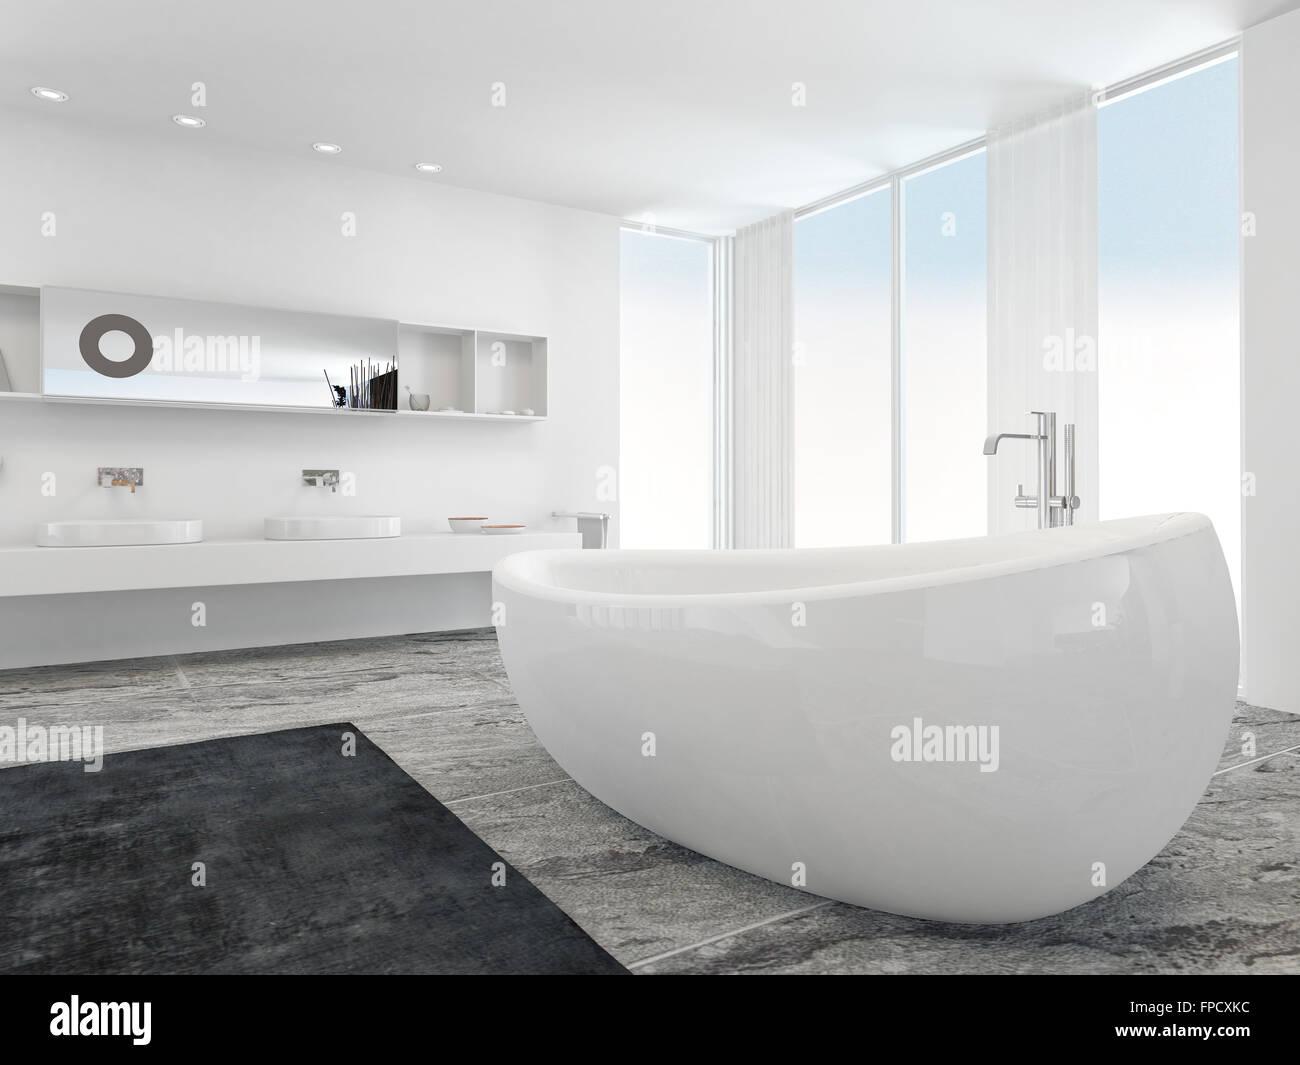 sehr ger umige helle moderne badezimmer interieur mit boden bis zur decke platte glasfenster auf. Black Bedroom Furniture Sets. Home Design Ideas